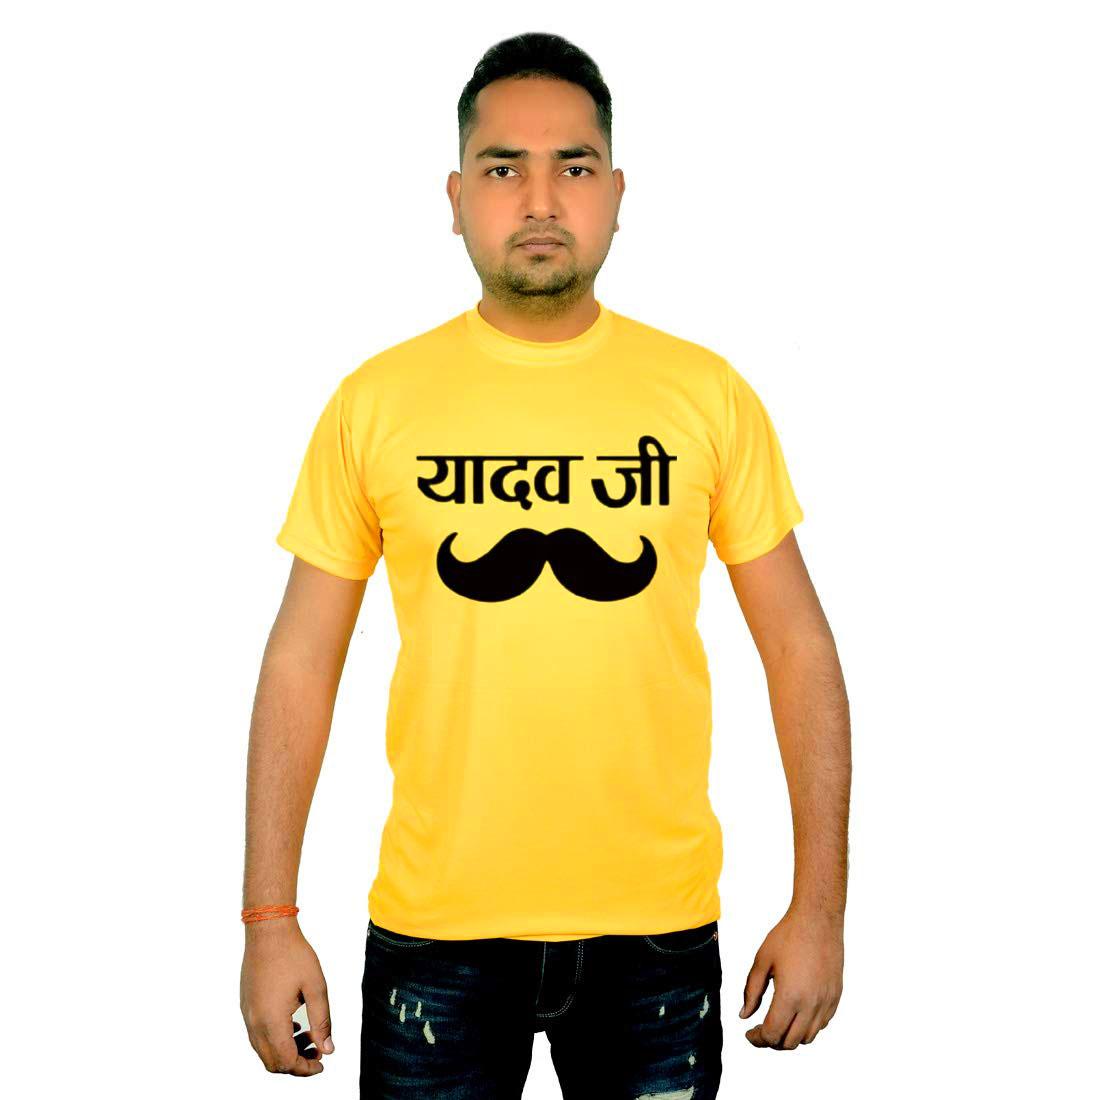 boy Yadav Ji Whatsapp Dp Images